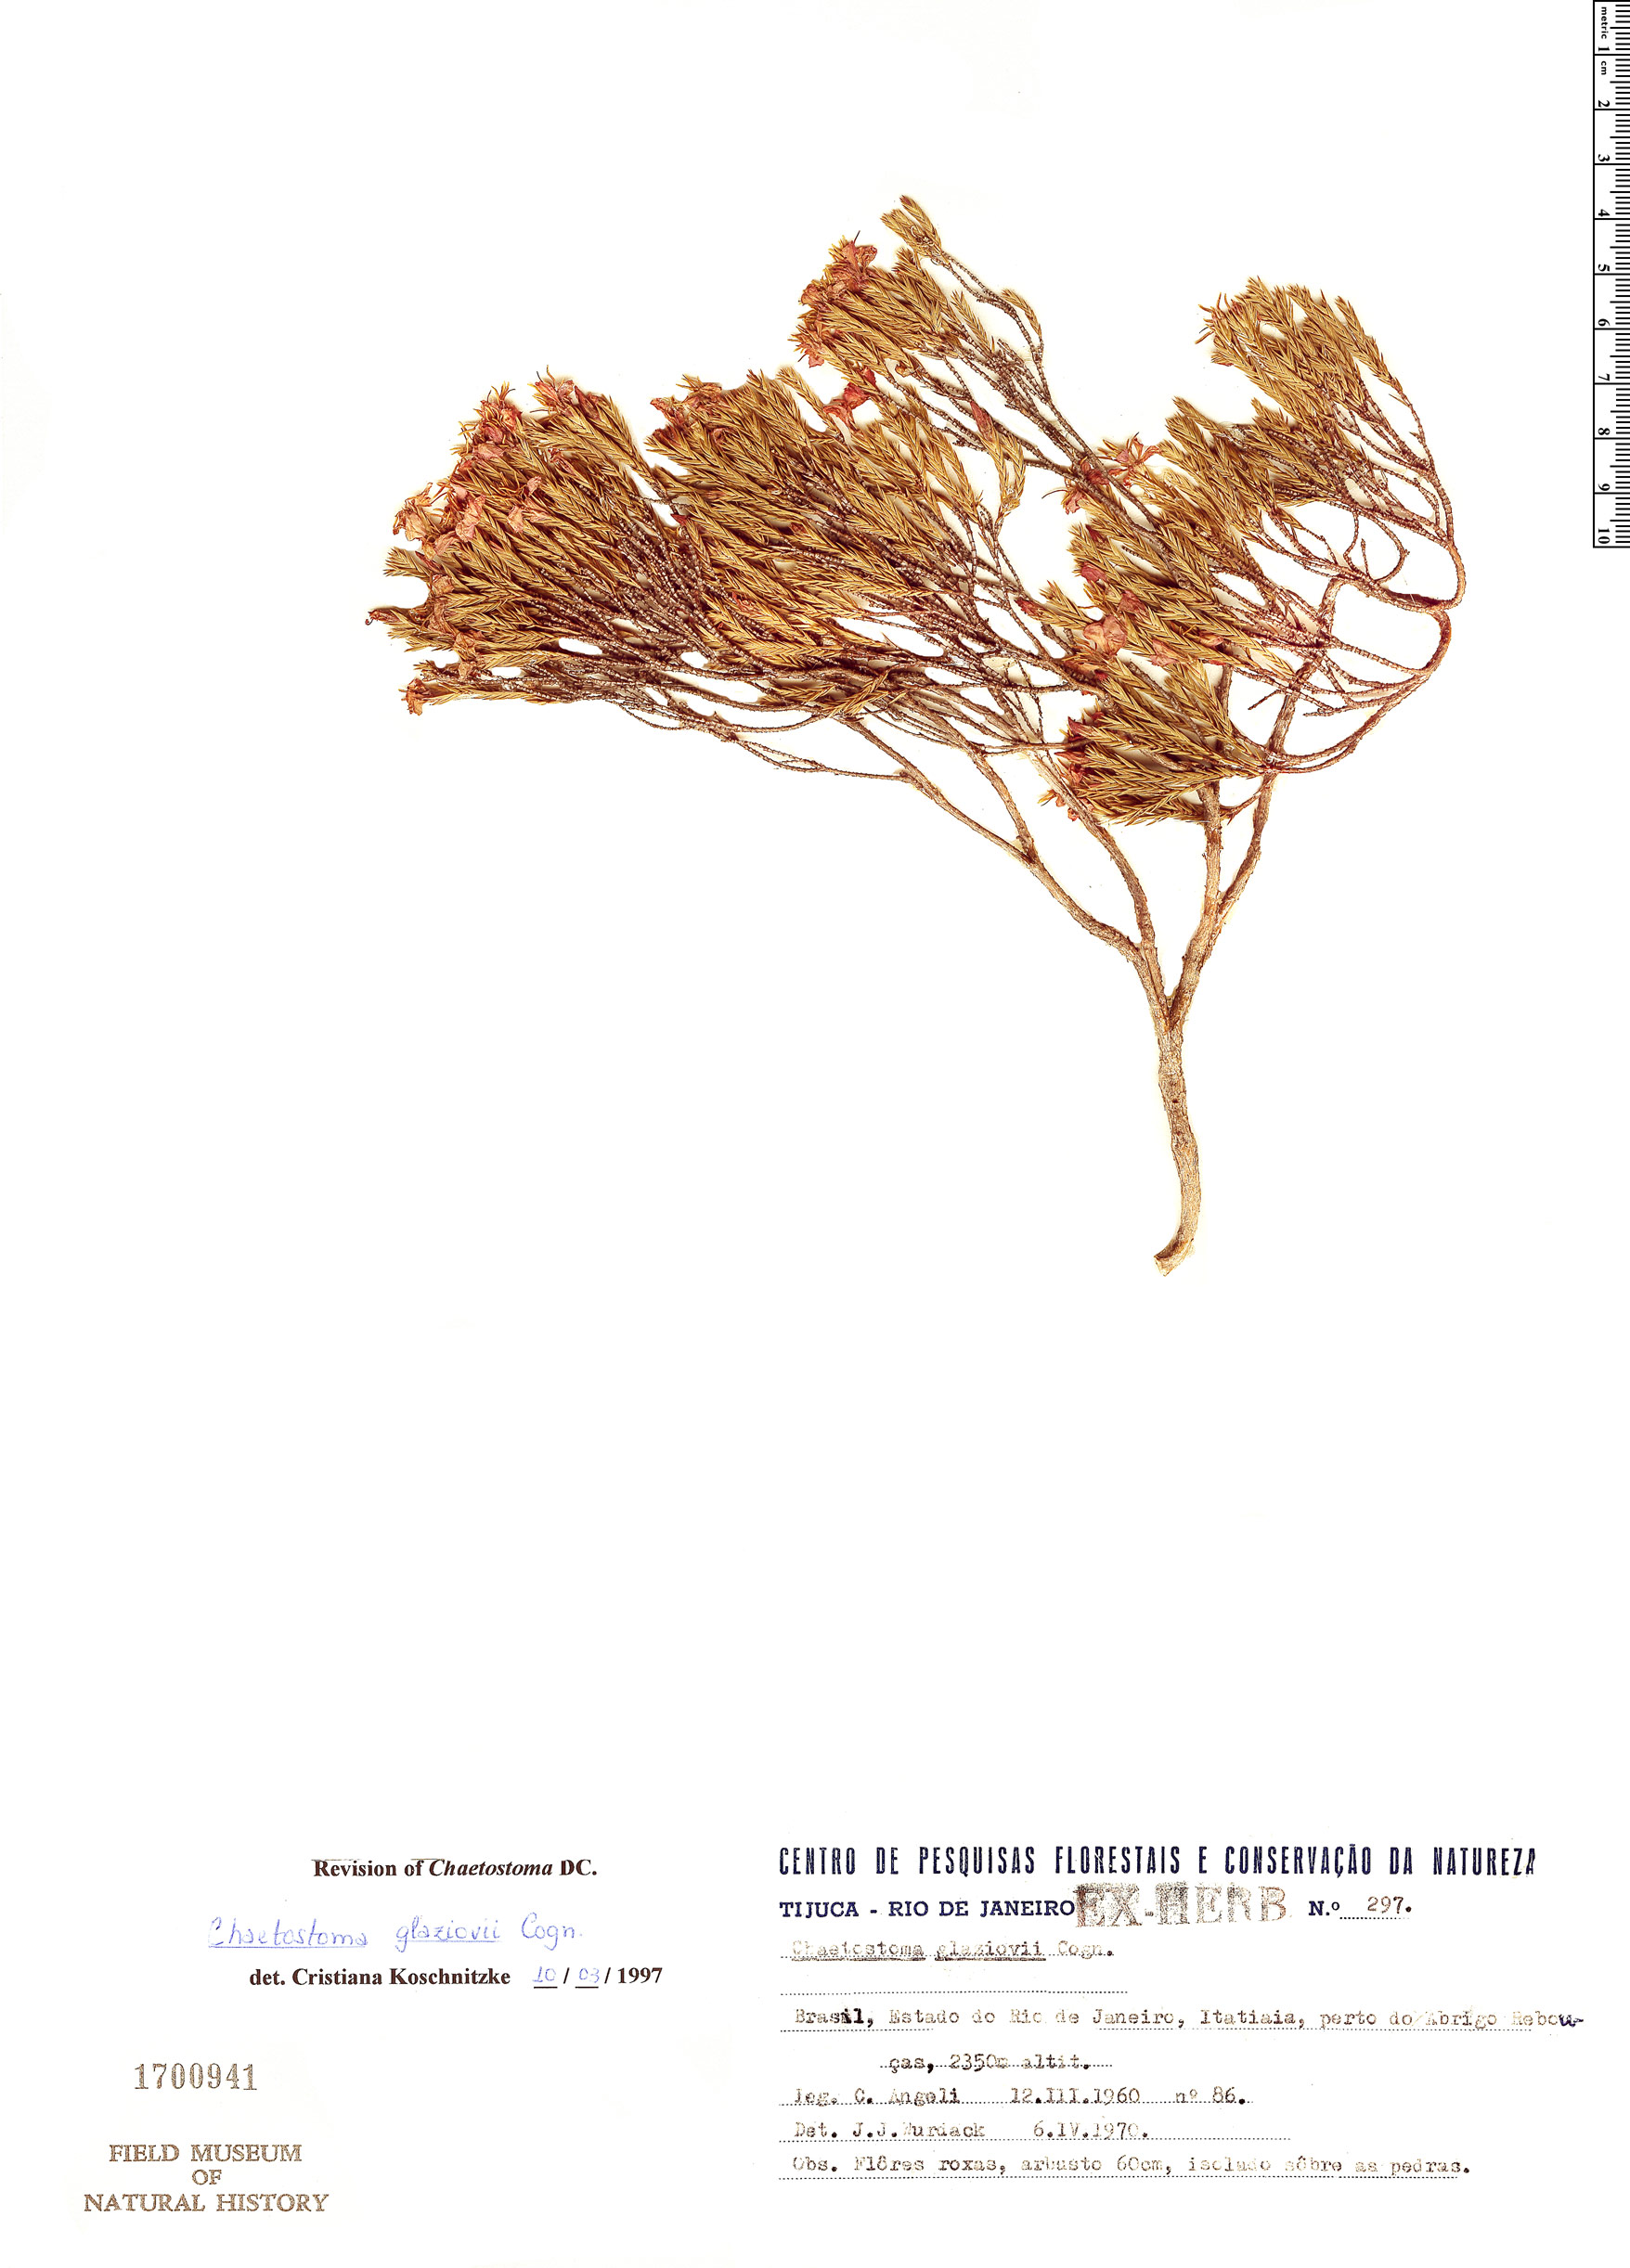 Specimen: Chaetostoma glaziovii